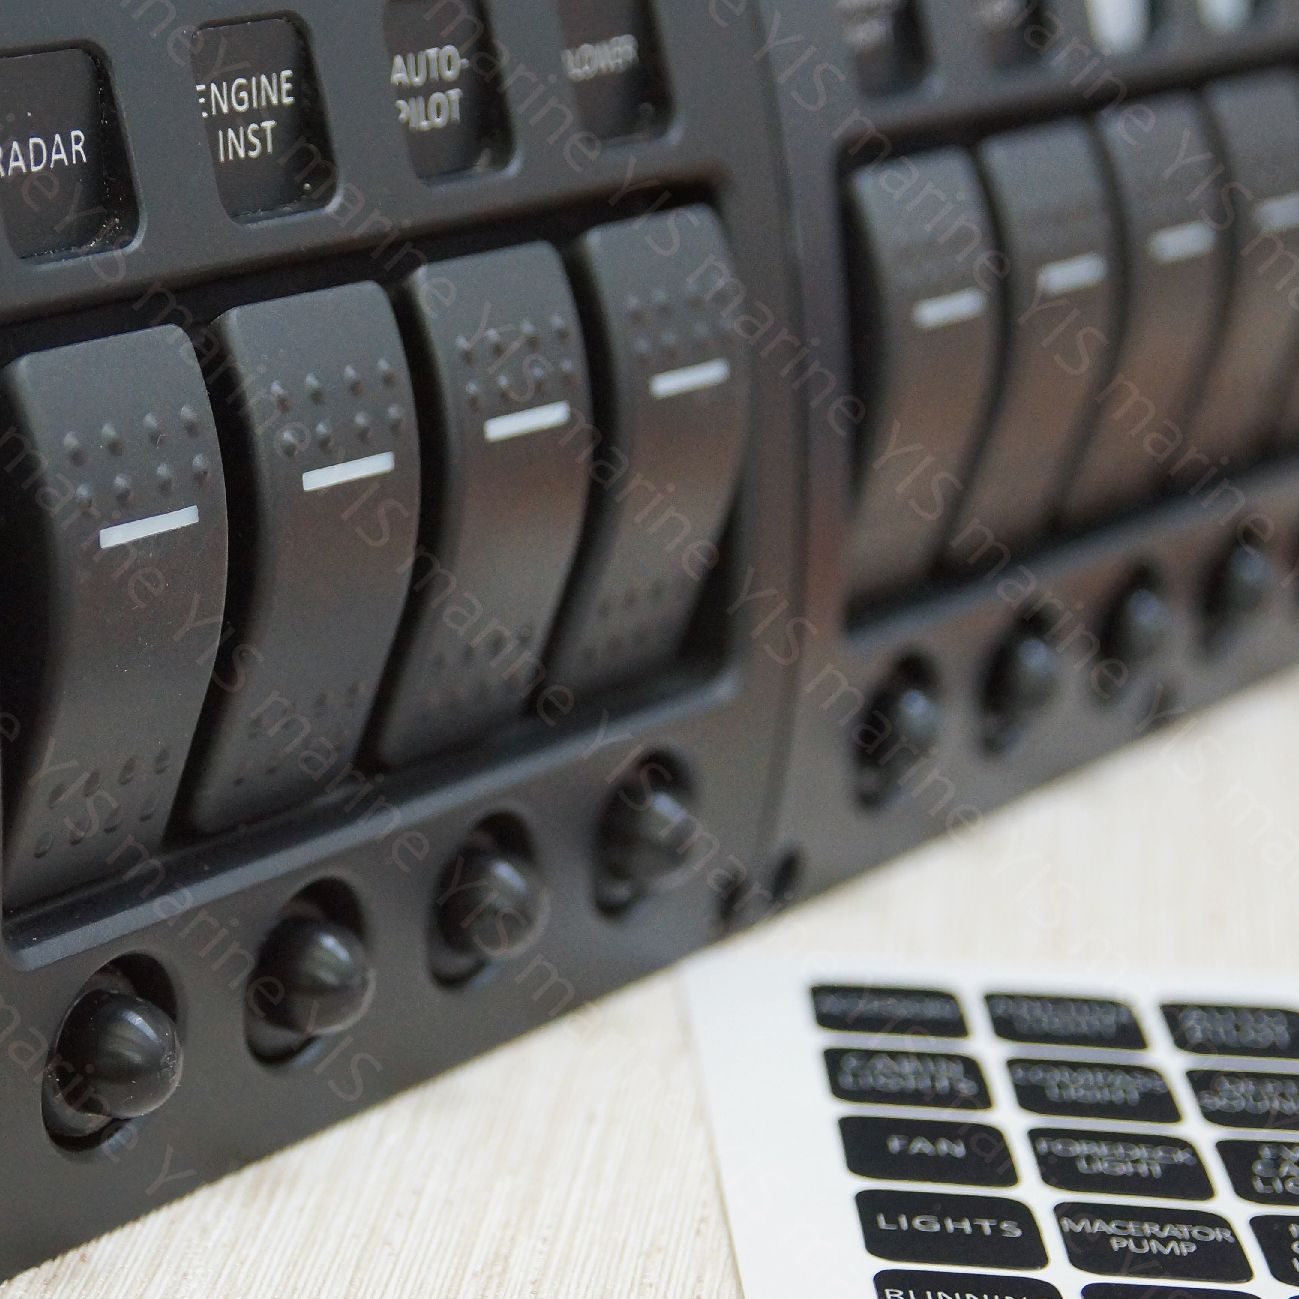 Switch Panels -  Marine Electrical Panels